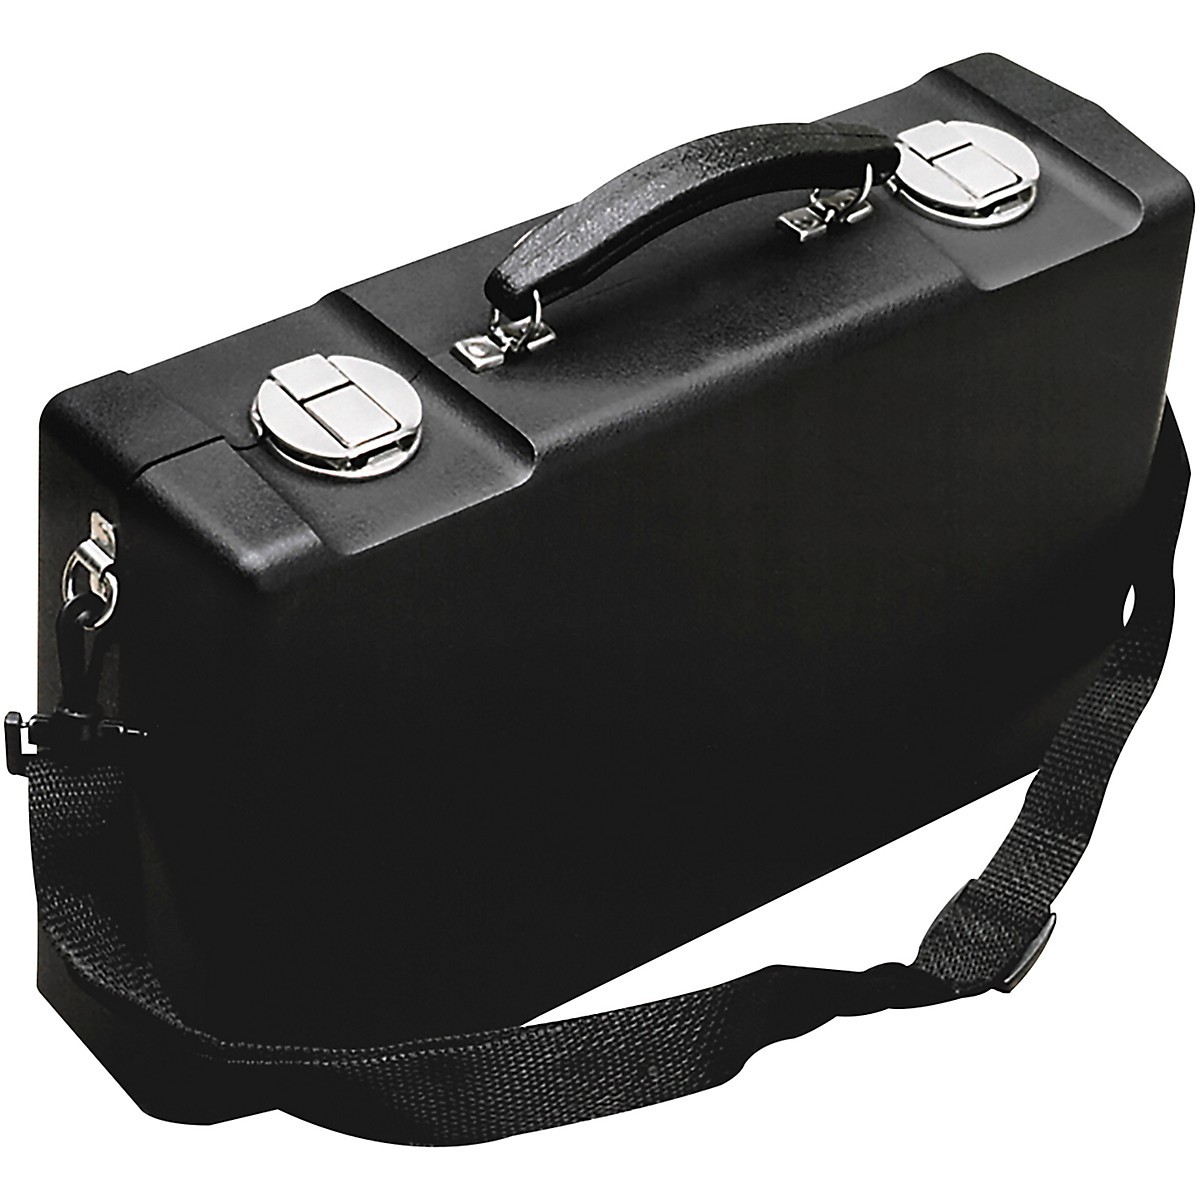 SKB SKB-320 Clarinet Case